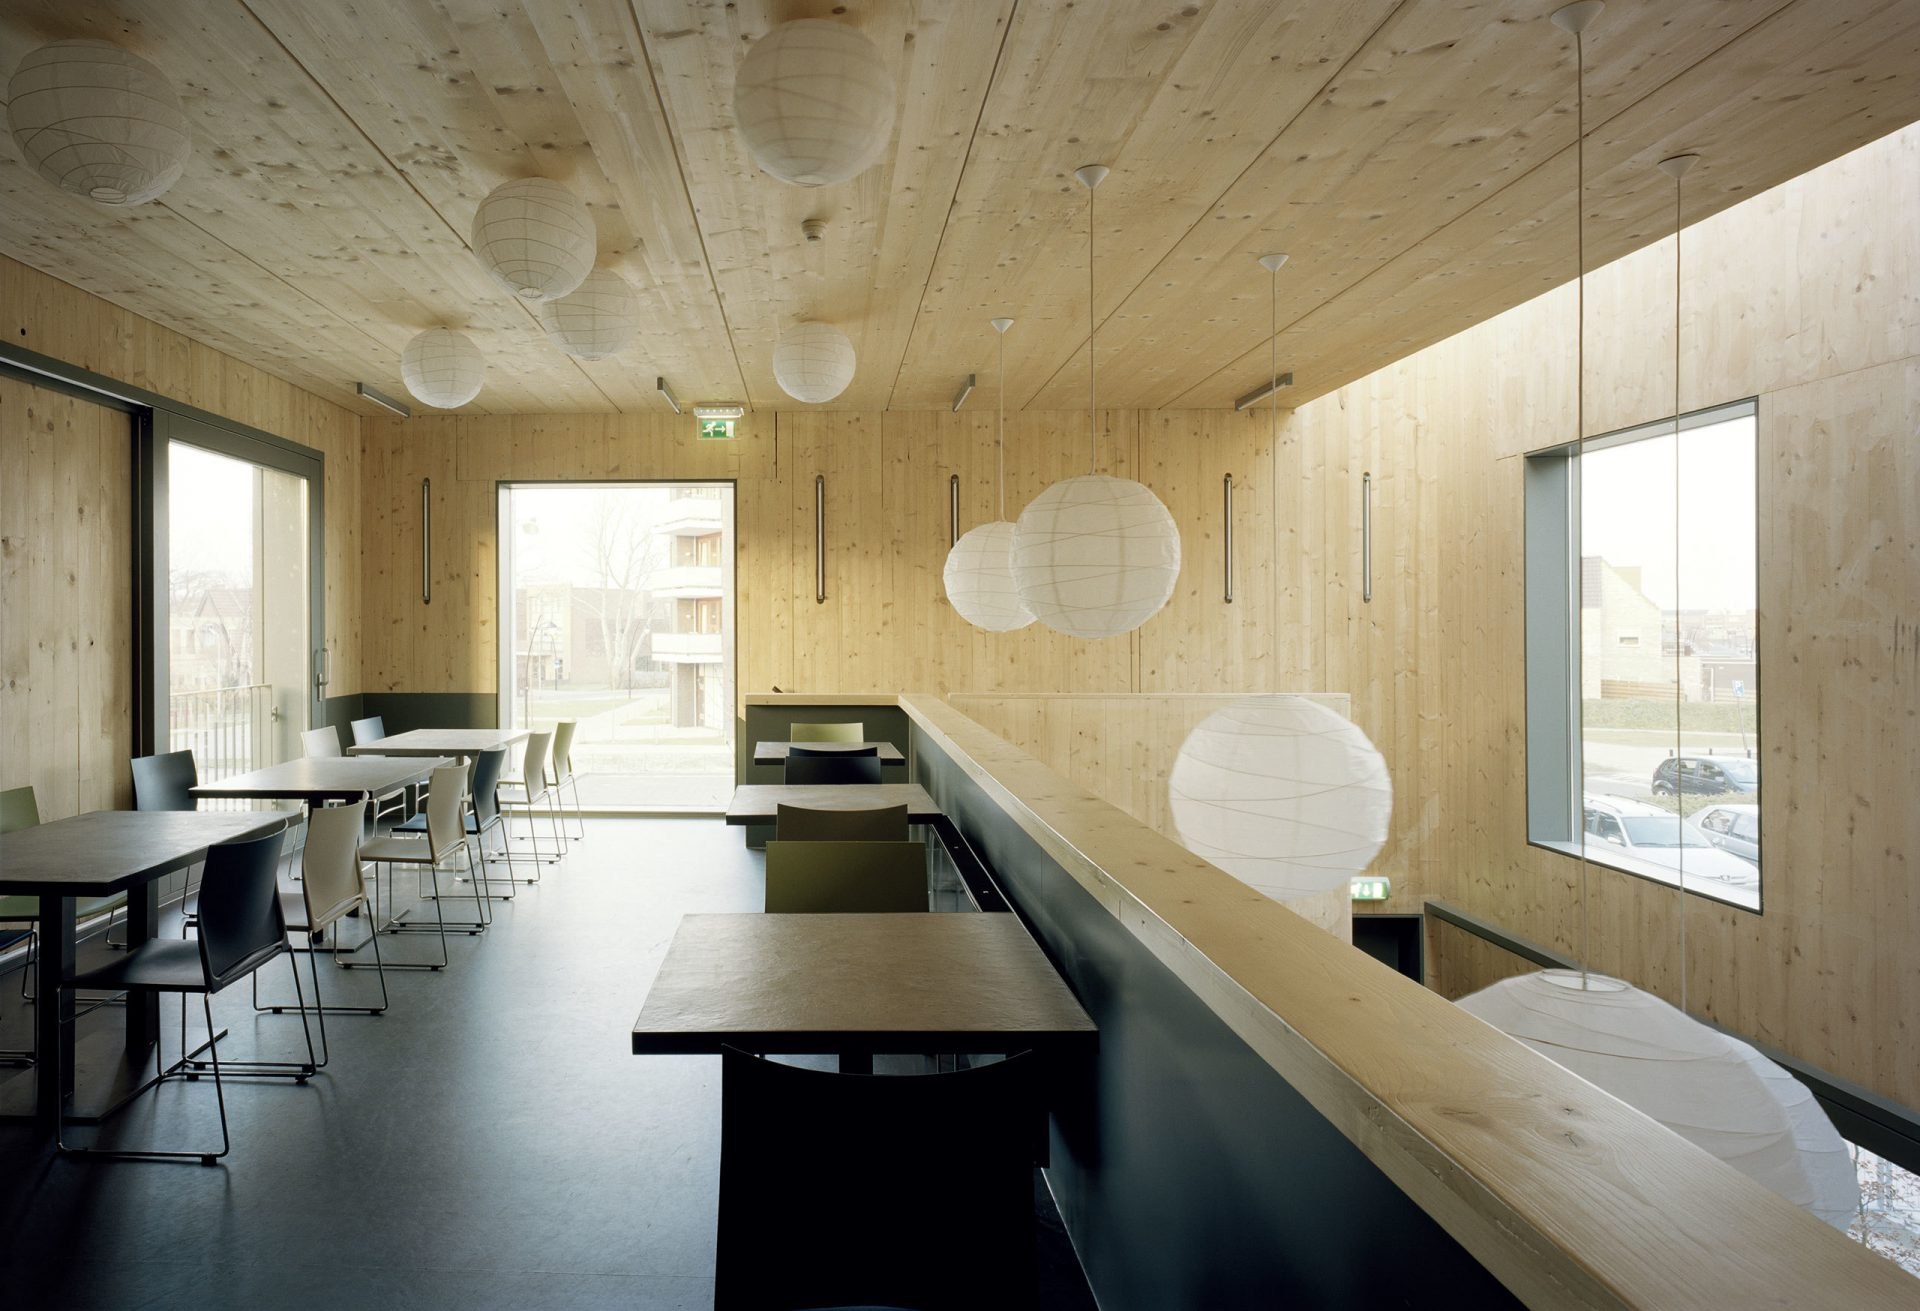 Kamers Lunch Room